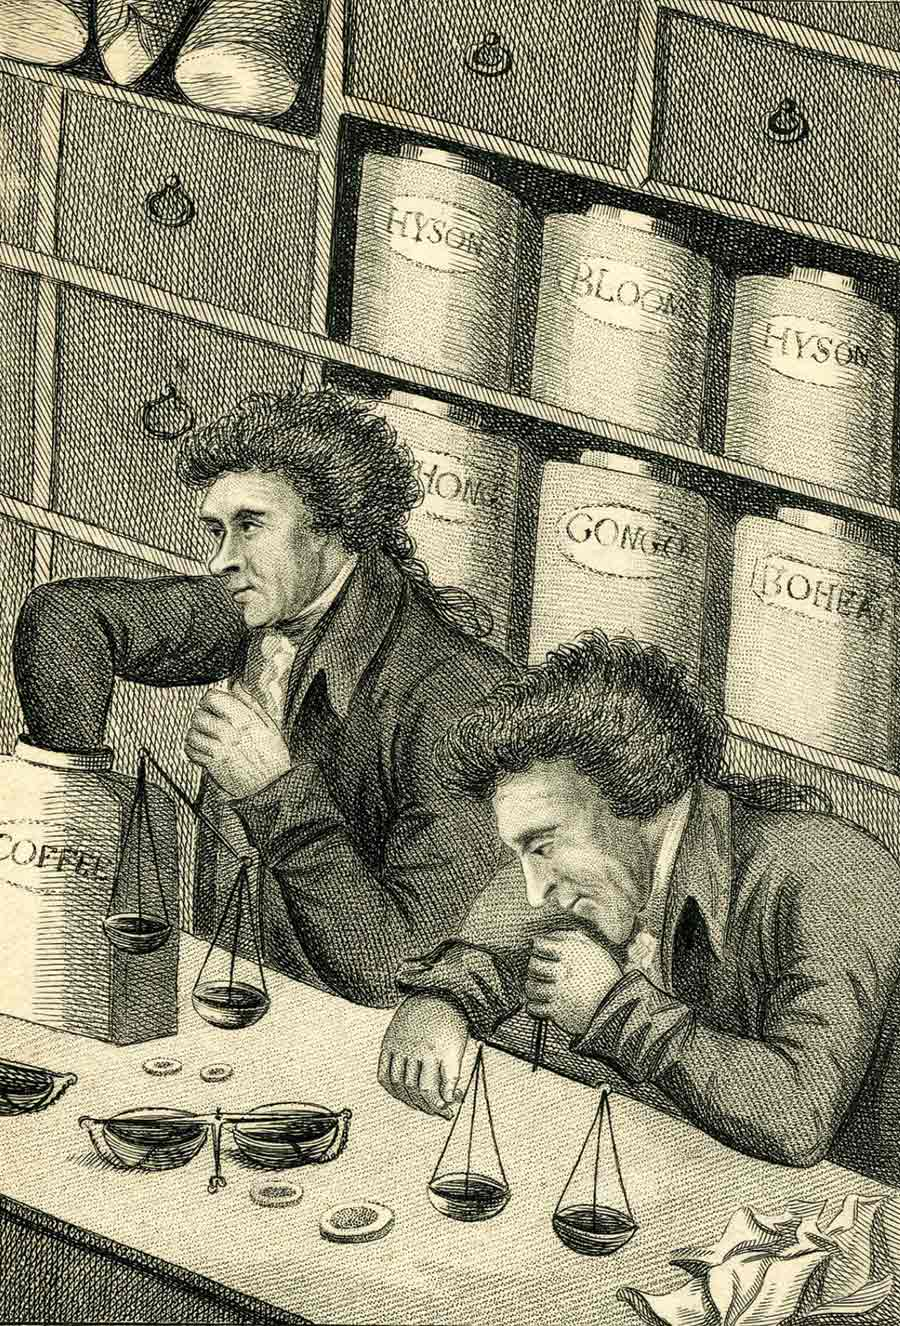 Image of tea grocers